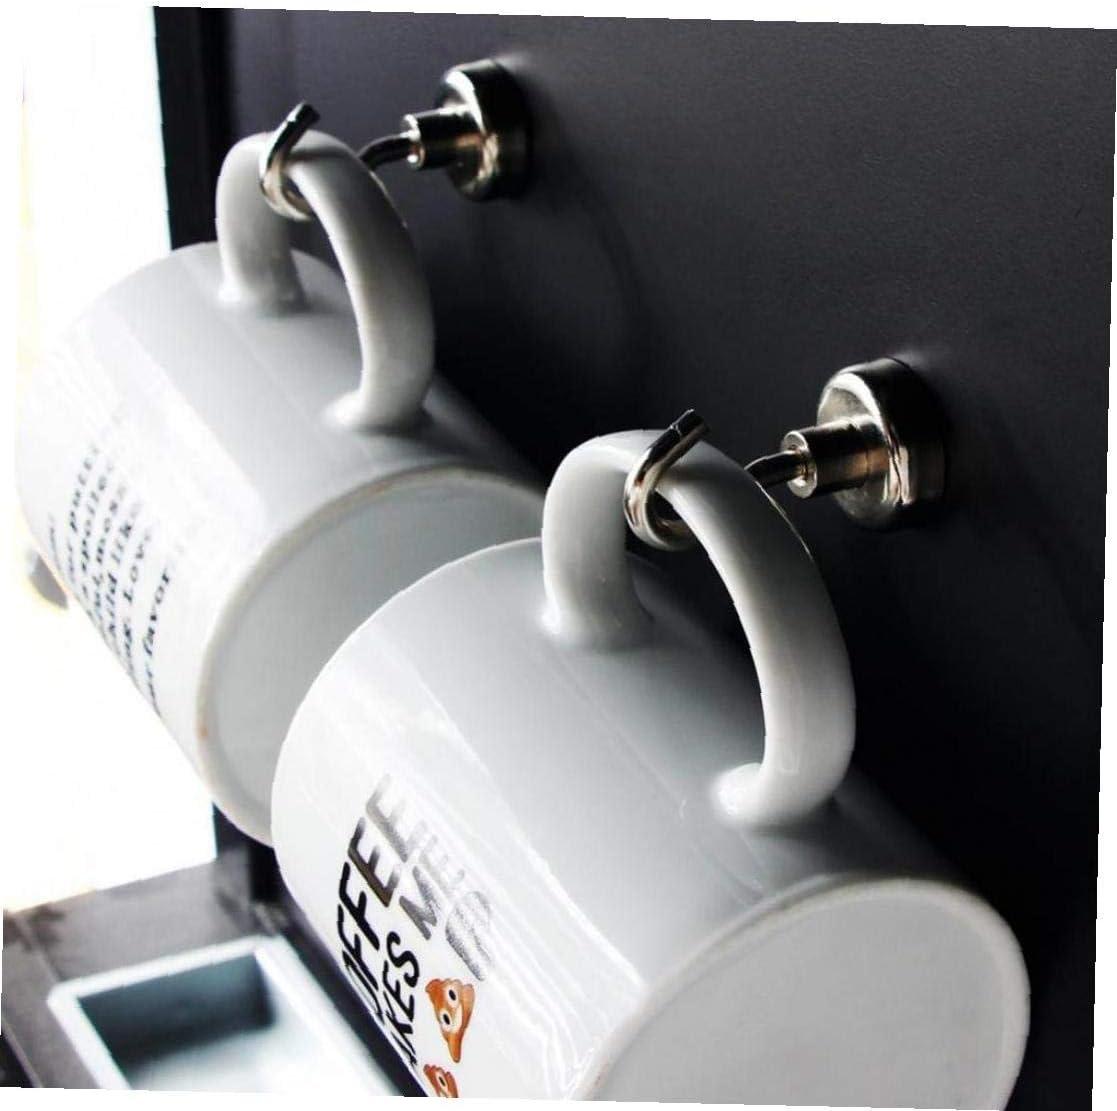 Aisoway 6 St/ück Starke Magnetische Haken Heavy Duty Neodym-Erde-Magnet-Haken NI Starke Korrosionsschutz